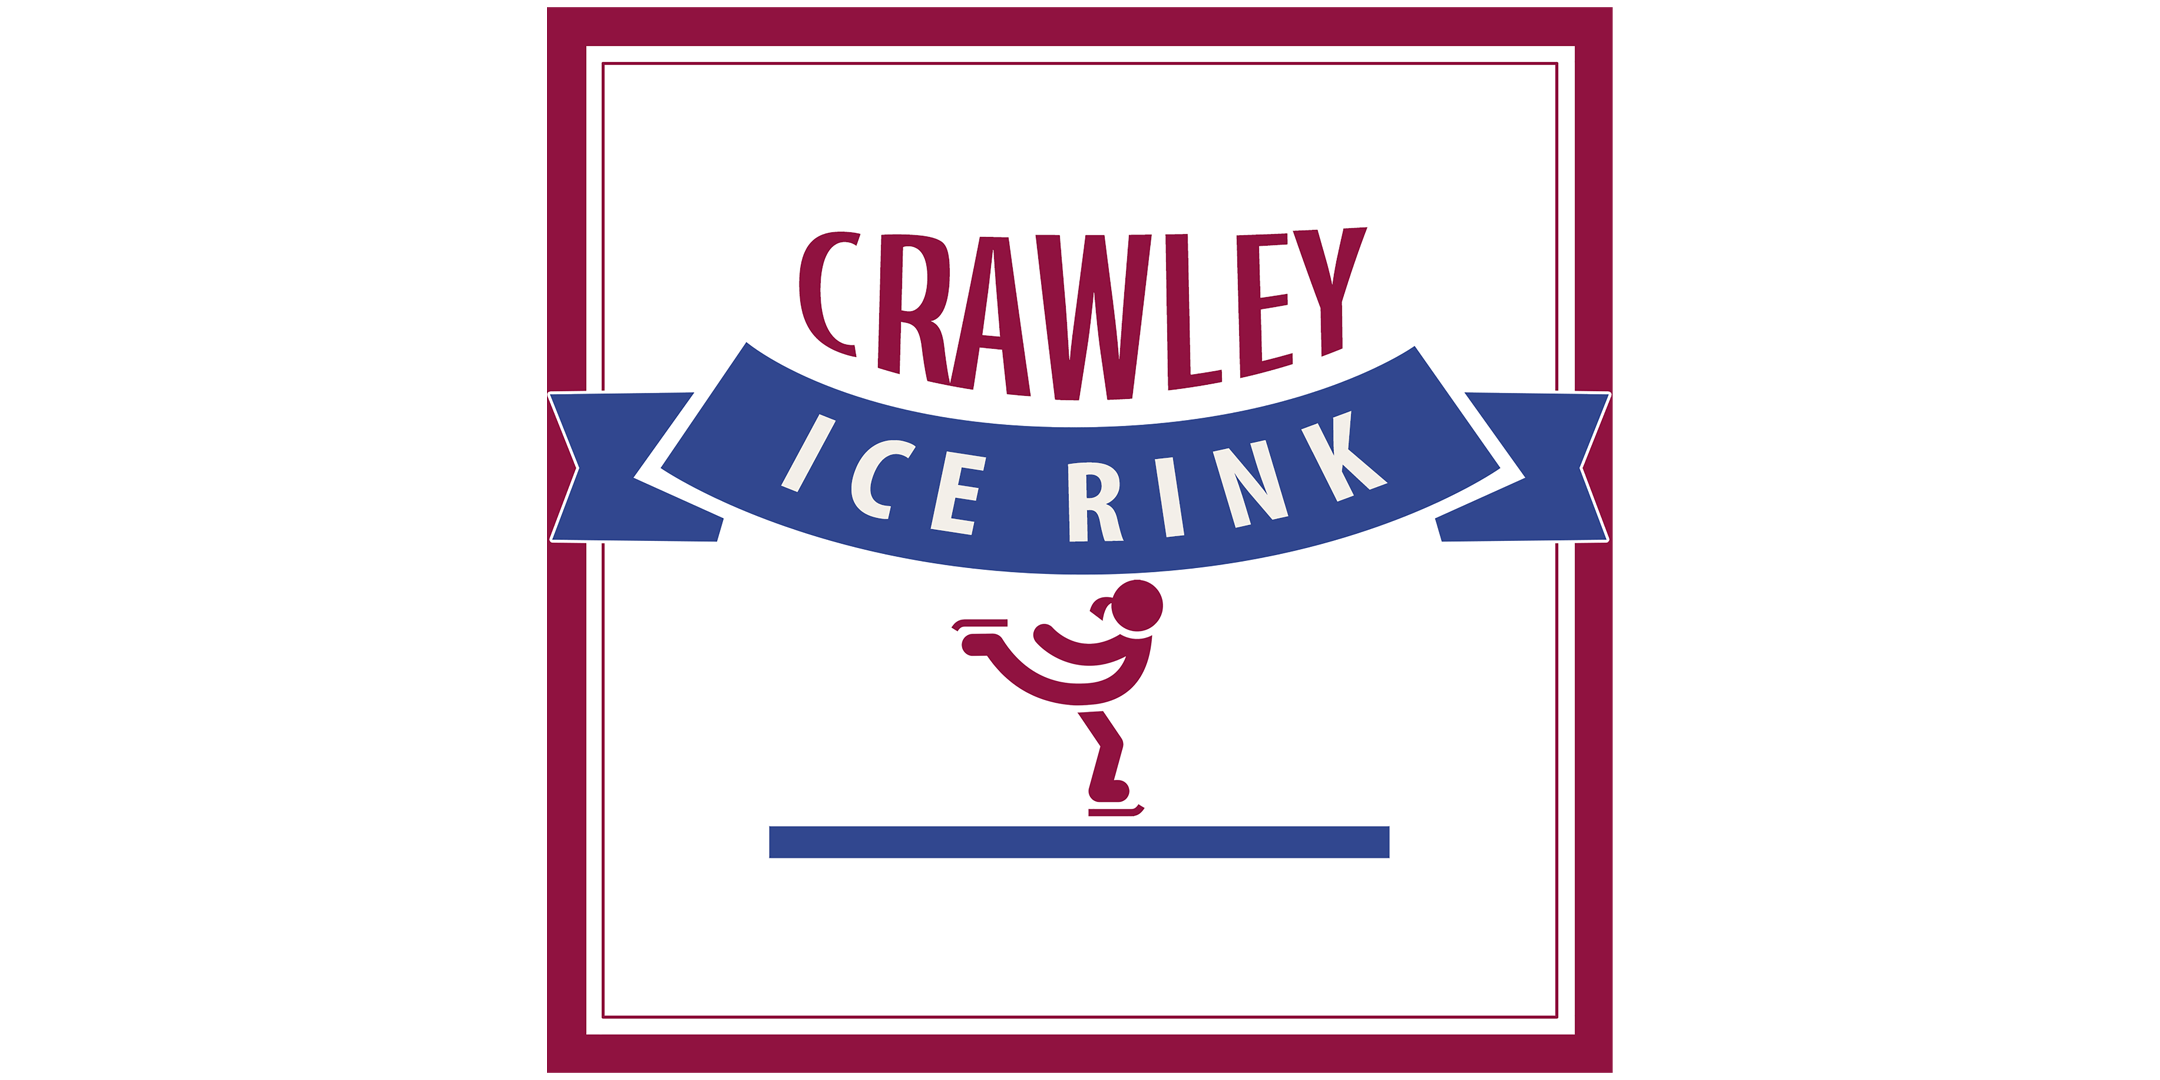 Crawley Ice Rink - 25th November (Off Peak)